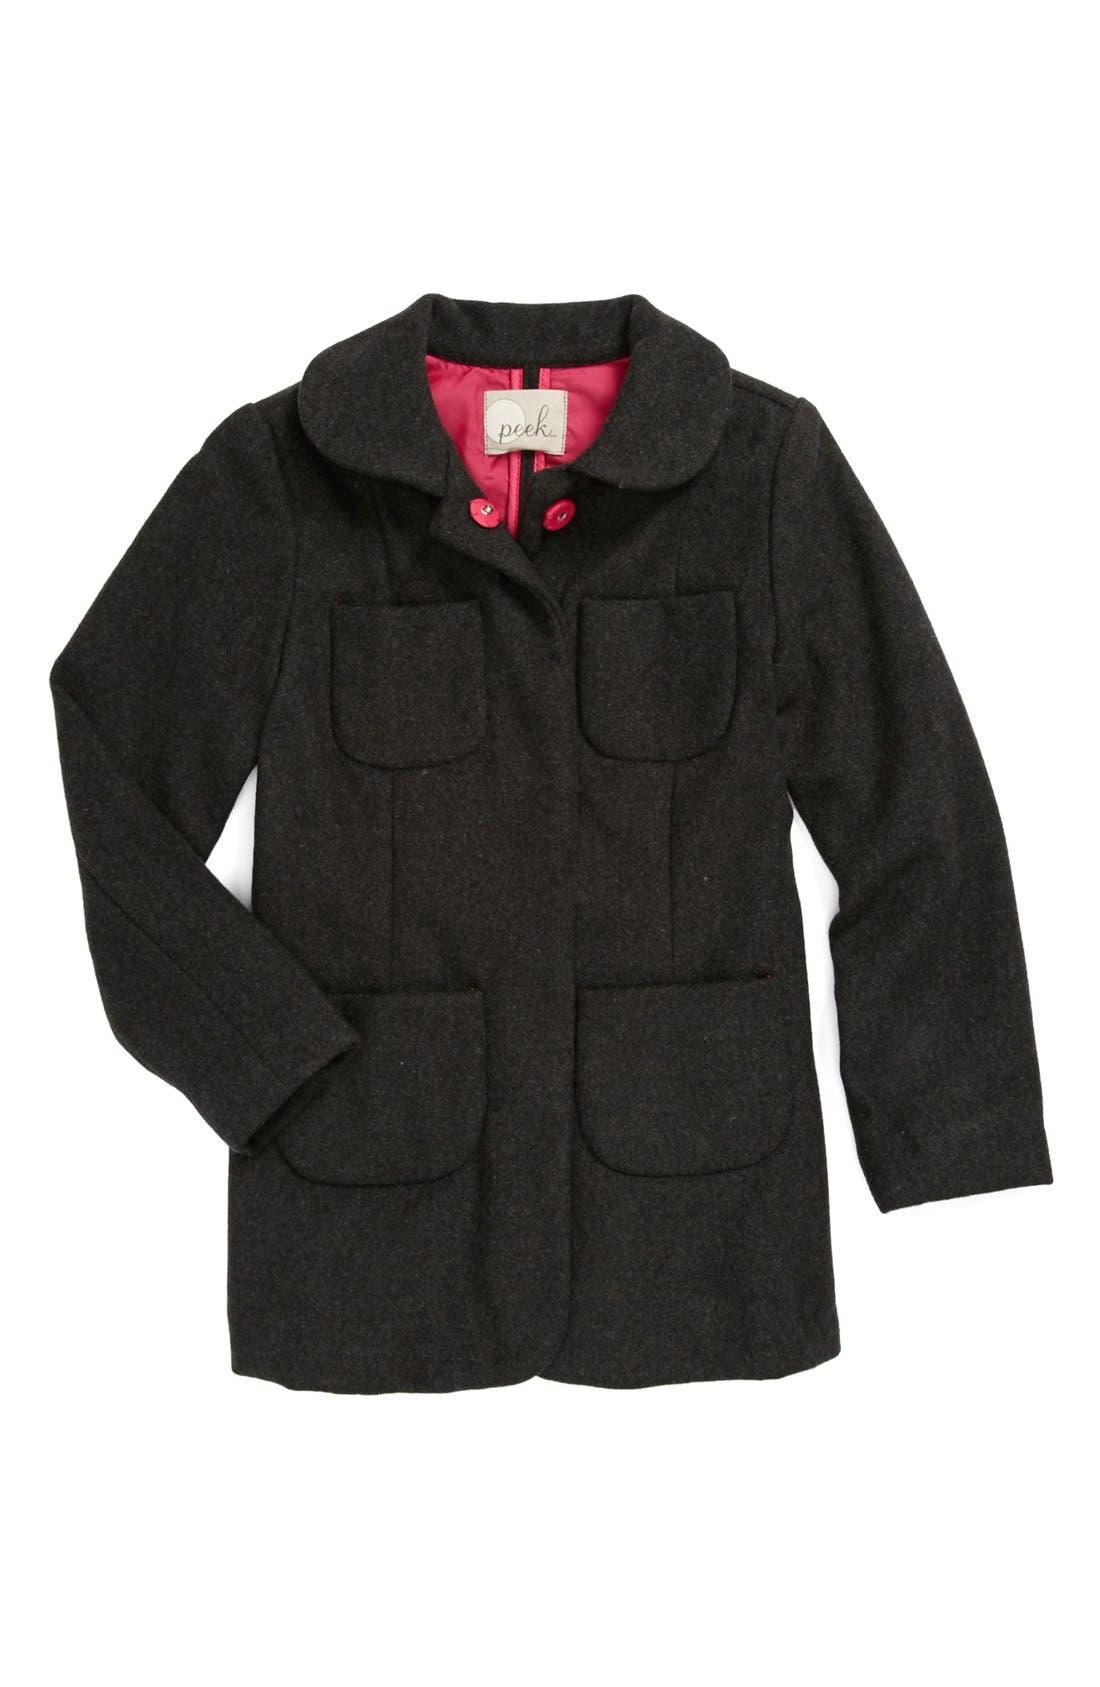 Alternate Image 1 Selected - Peek 'Tomasine' Coat (Toddler Girls, Little Girls & Big Girls)